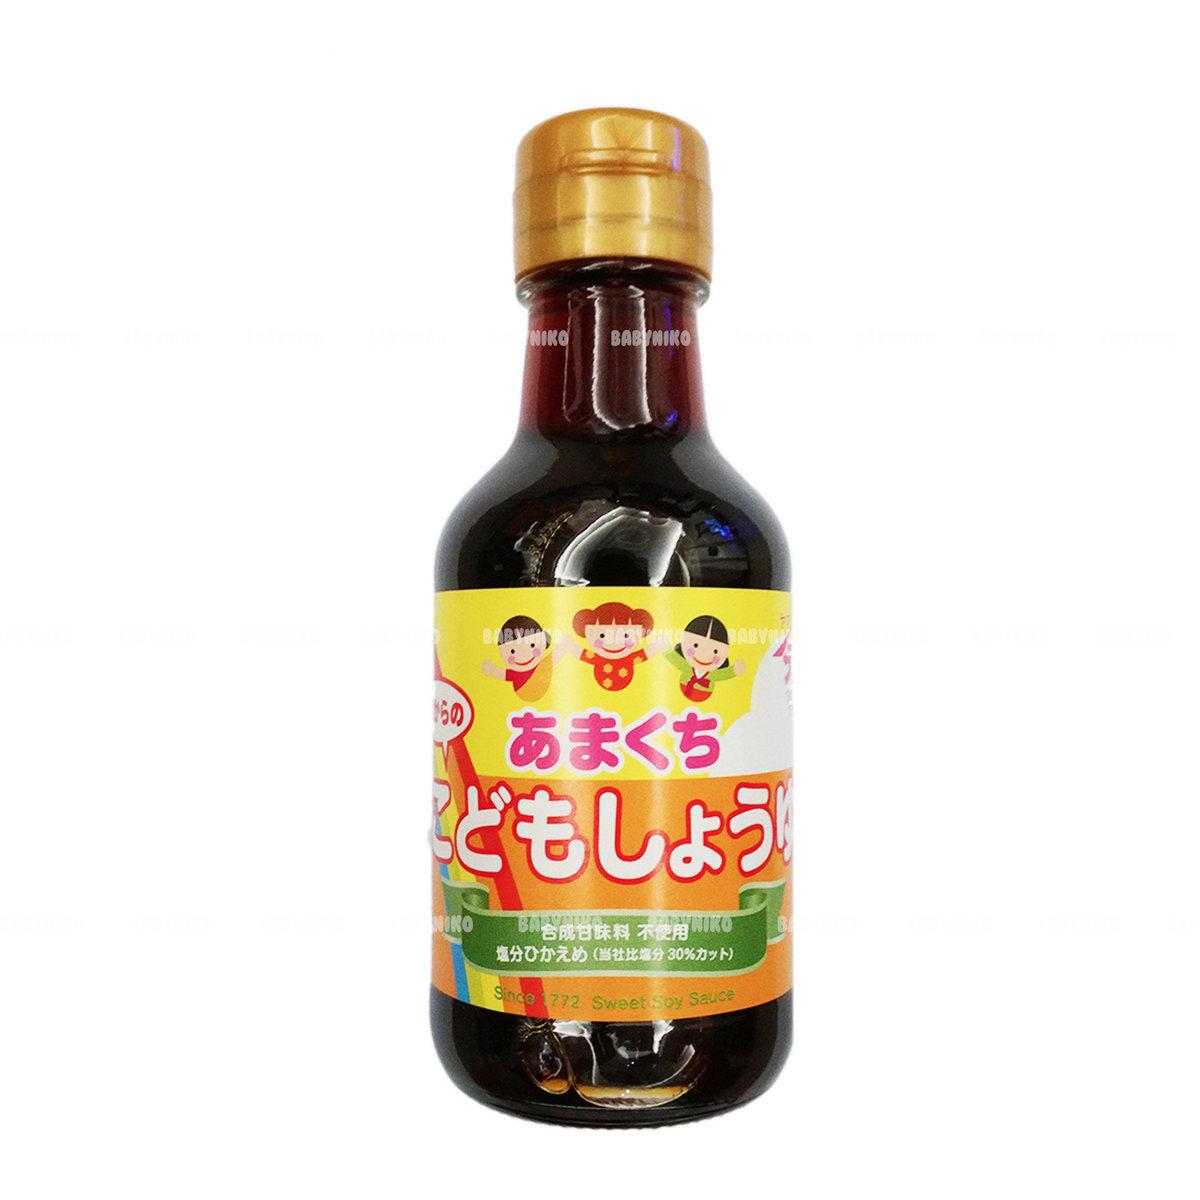 Yamagen Japan Soy Sauce (Salt Reduce) for 1 year old +